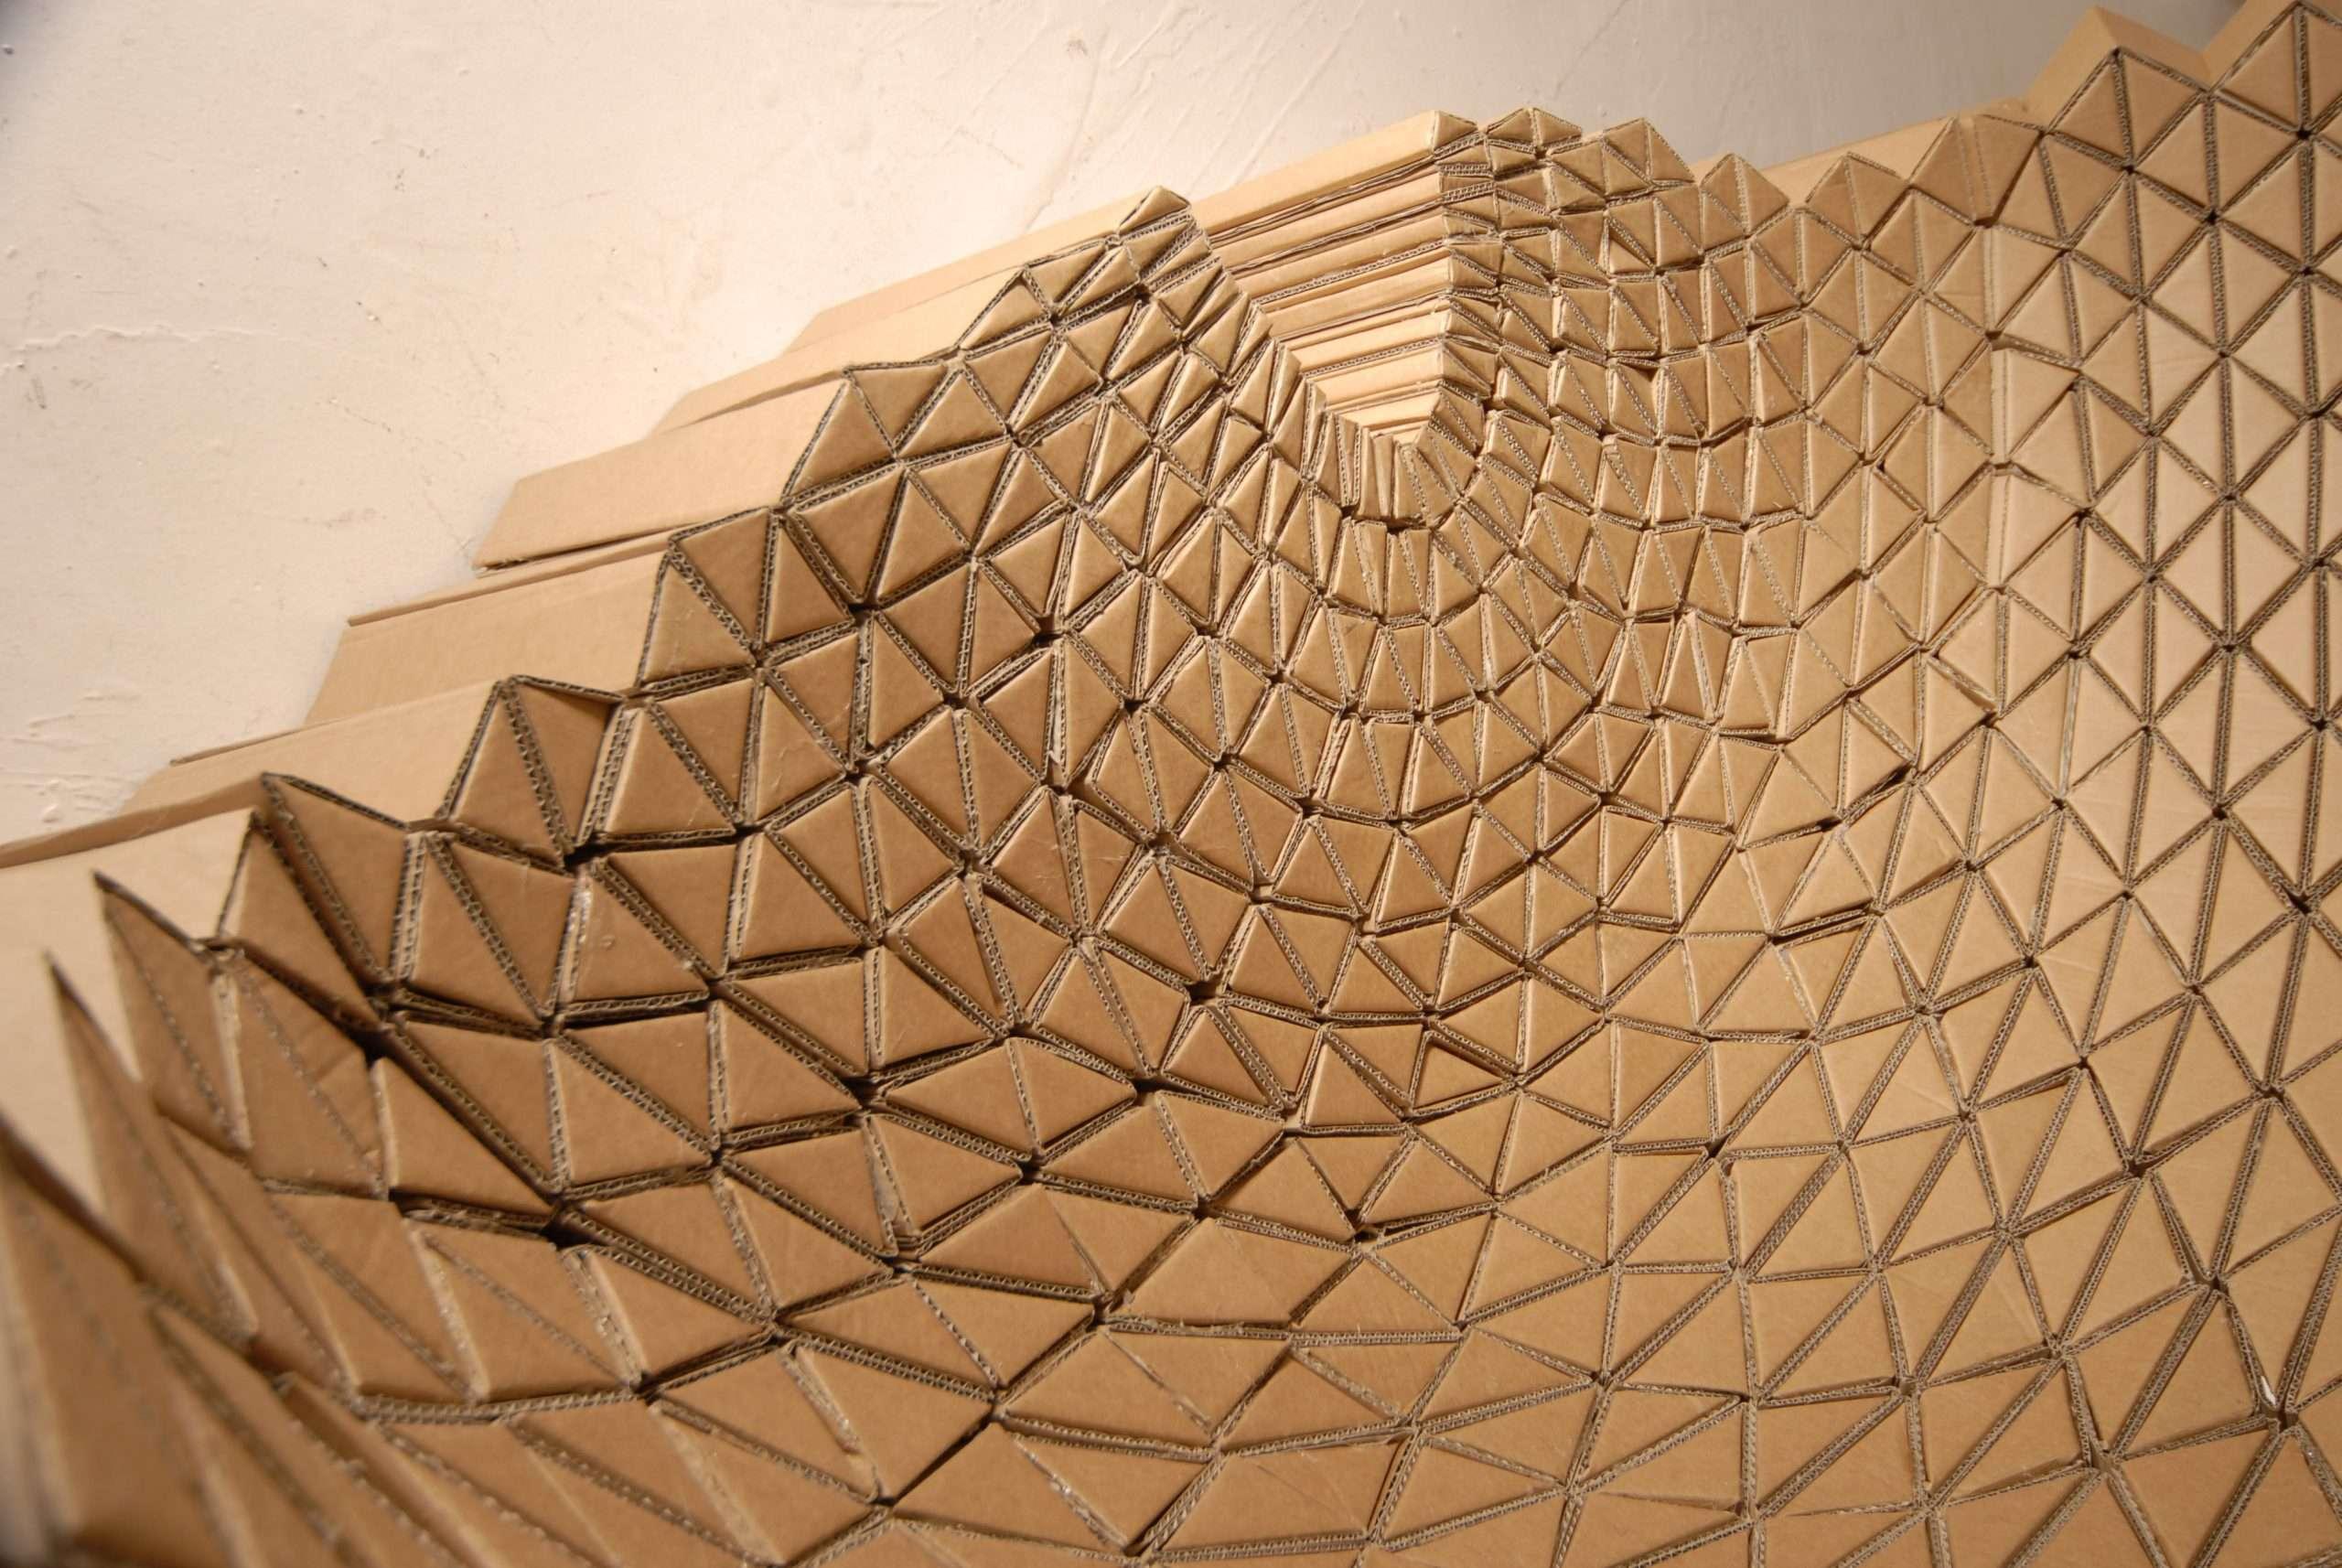 Close up of a creative cardboard sofa design by design studio lazerian